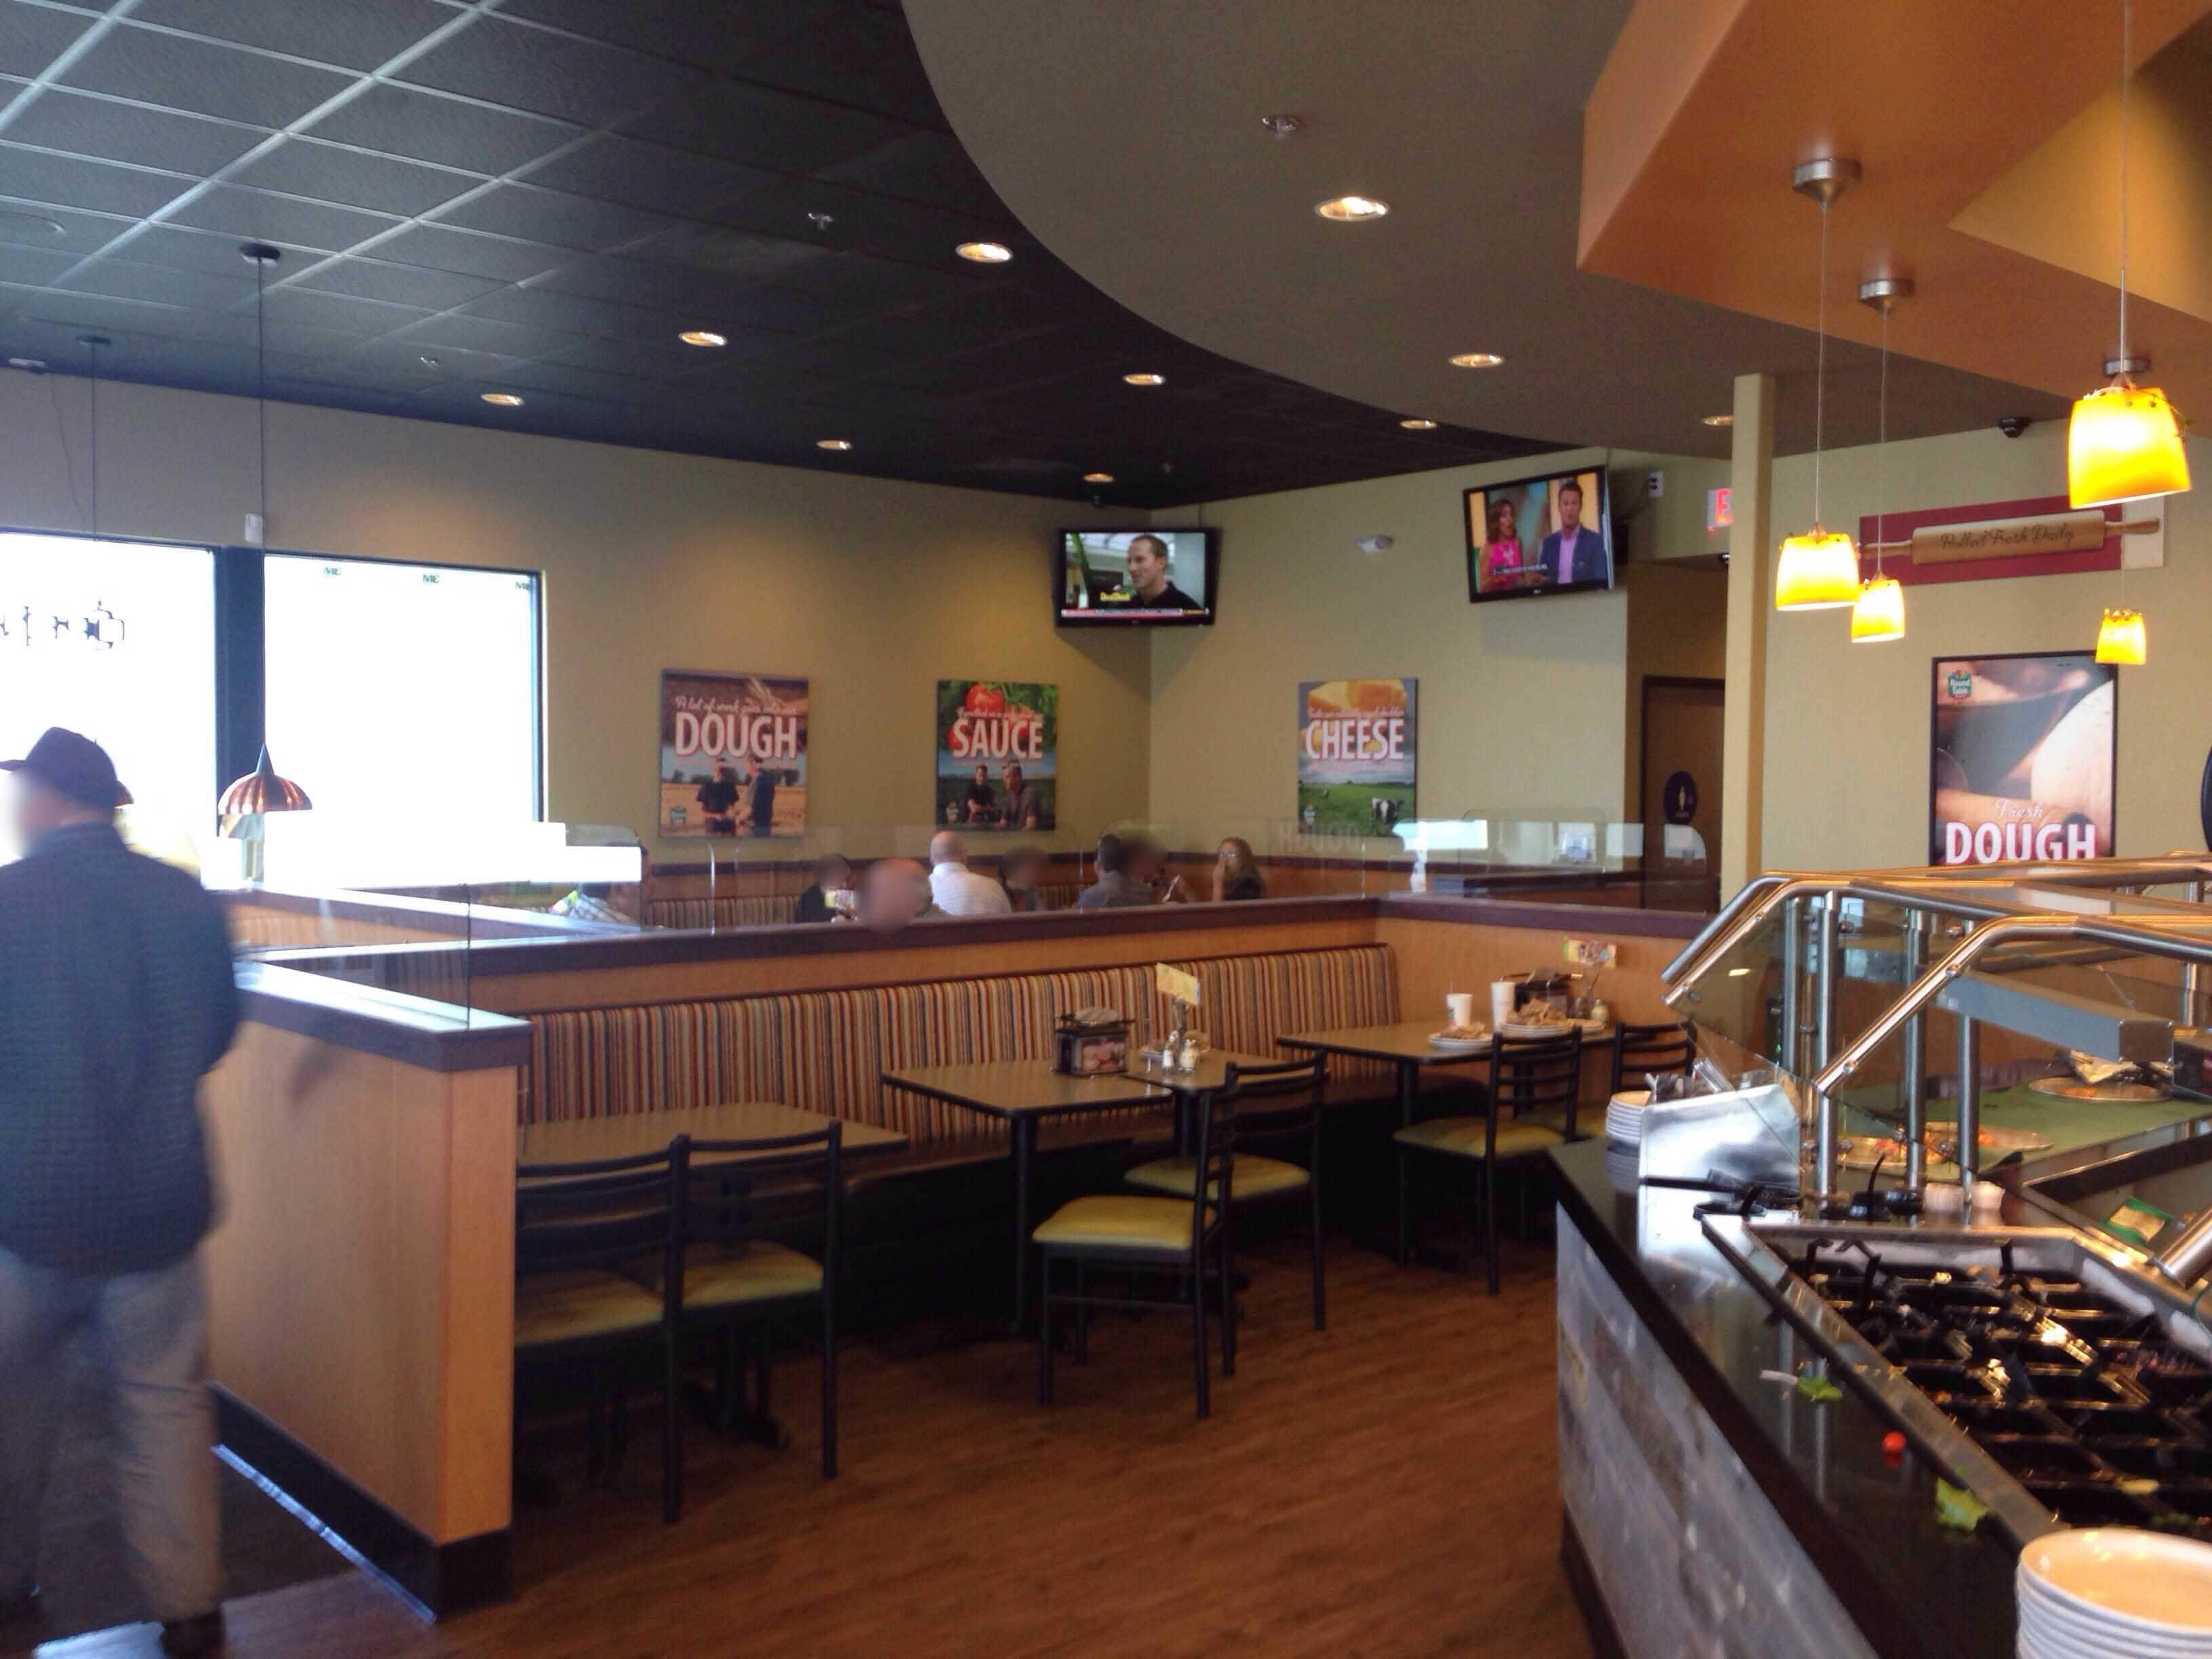 round table pizza menu menu for round table pizza napa napa rh zomato com round table napa menu round table napa soscol